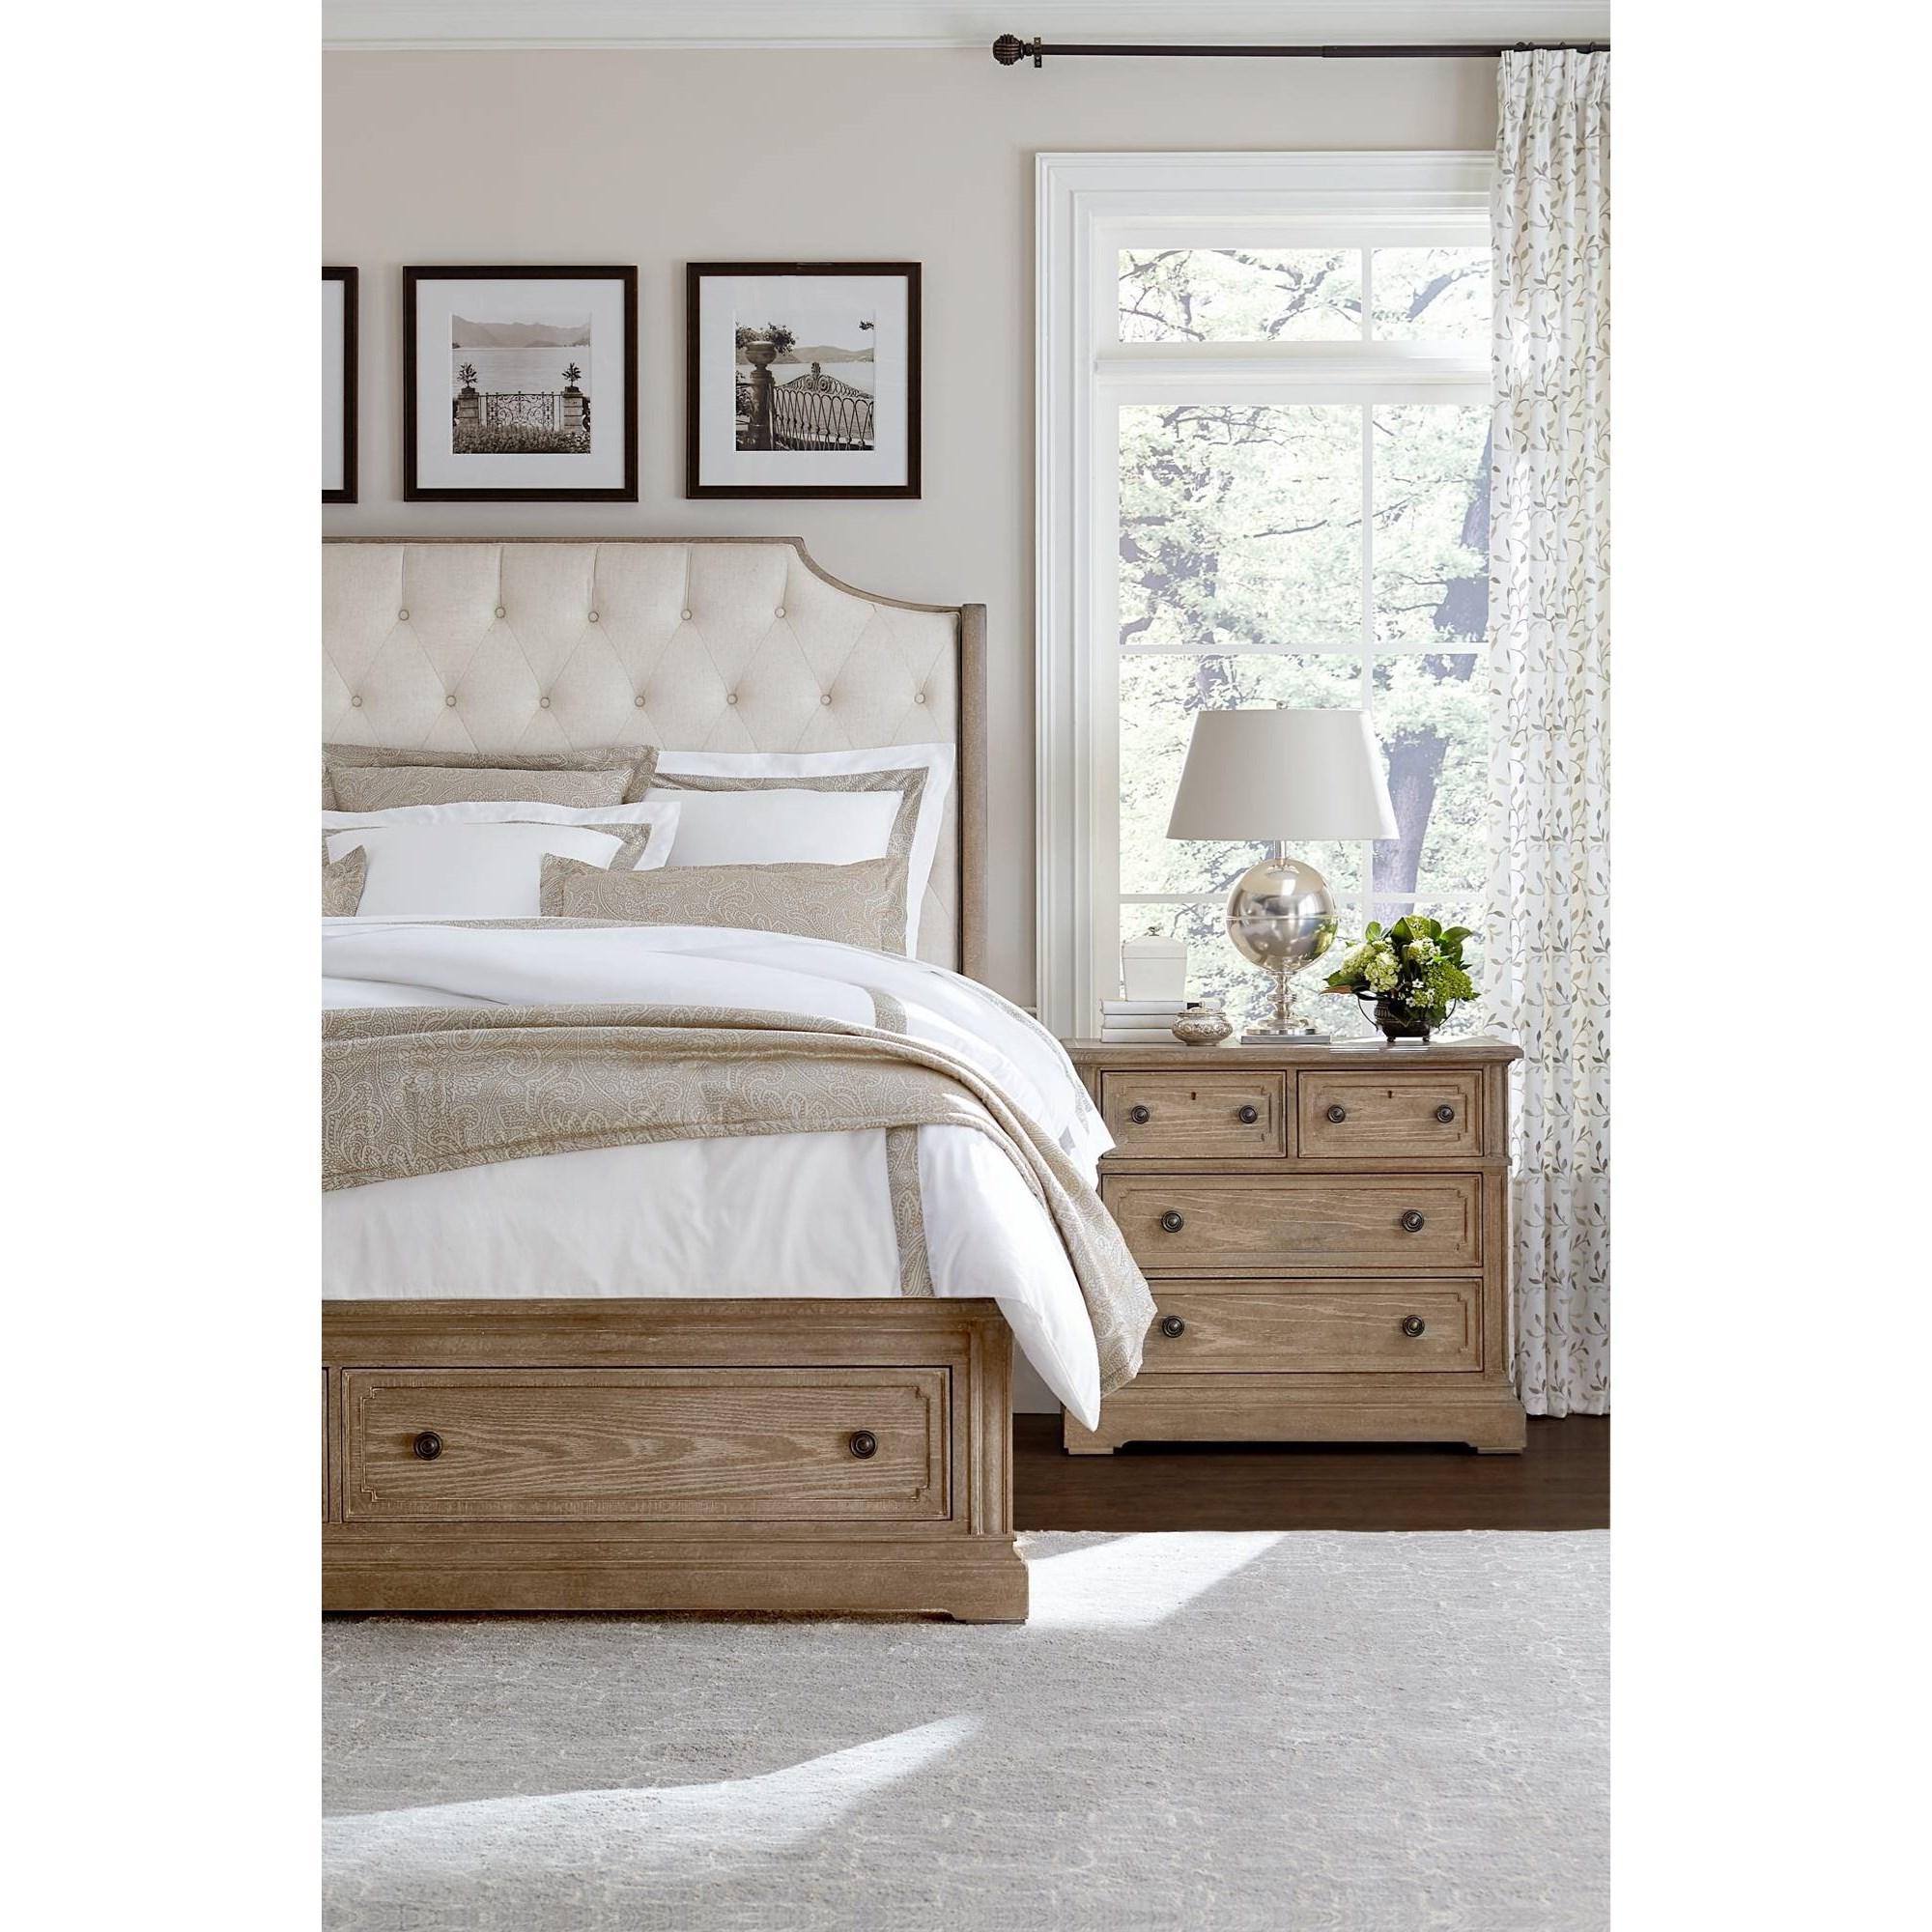 Stanley Furniture Wethersfield Estate King Bedroom Group Belfort Furniture Bedroom Groups